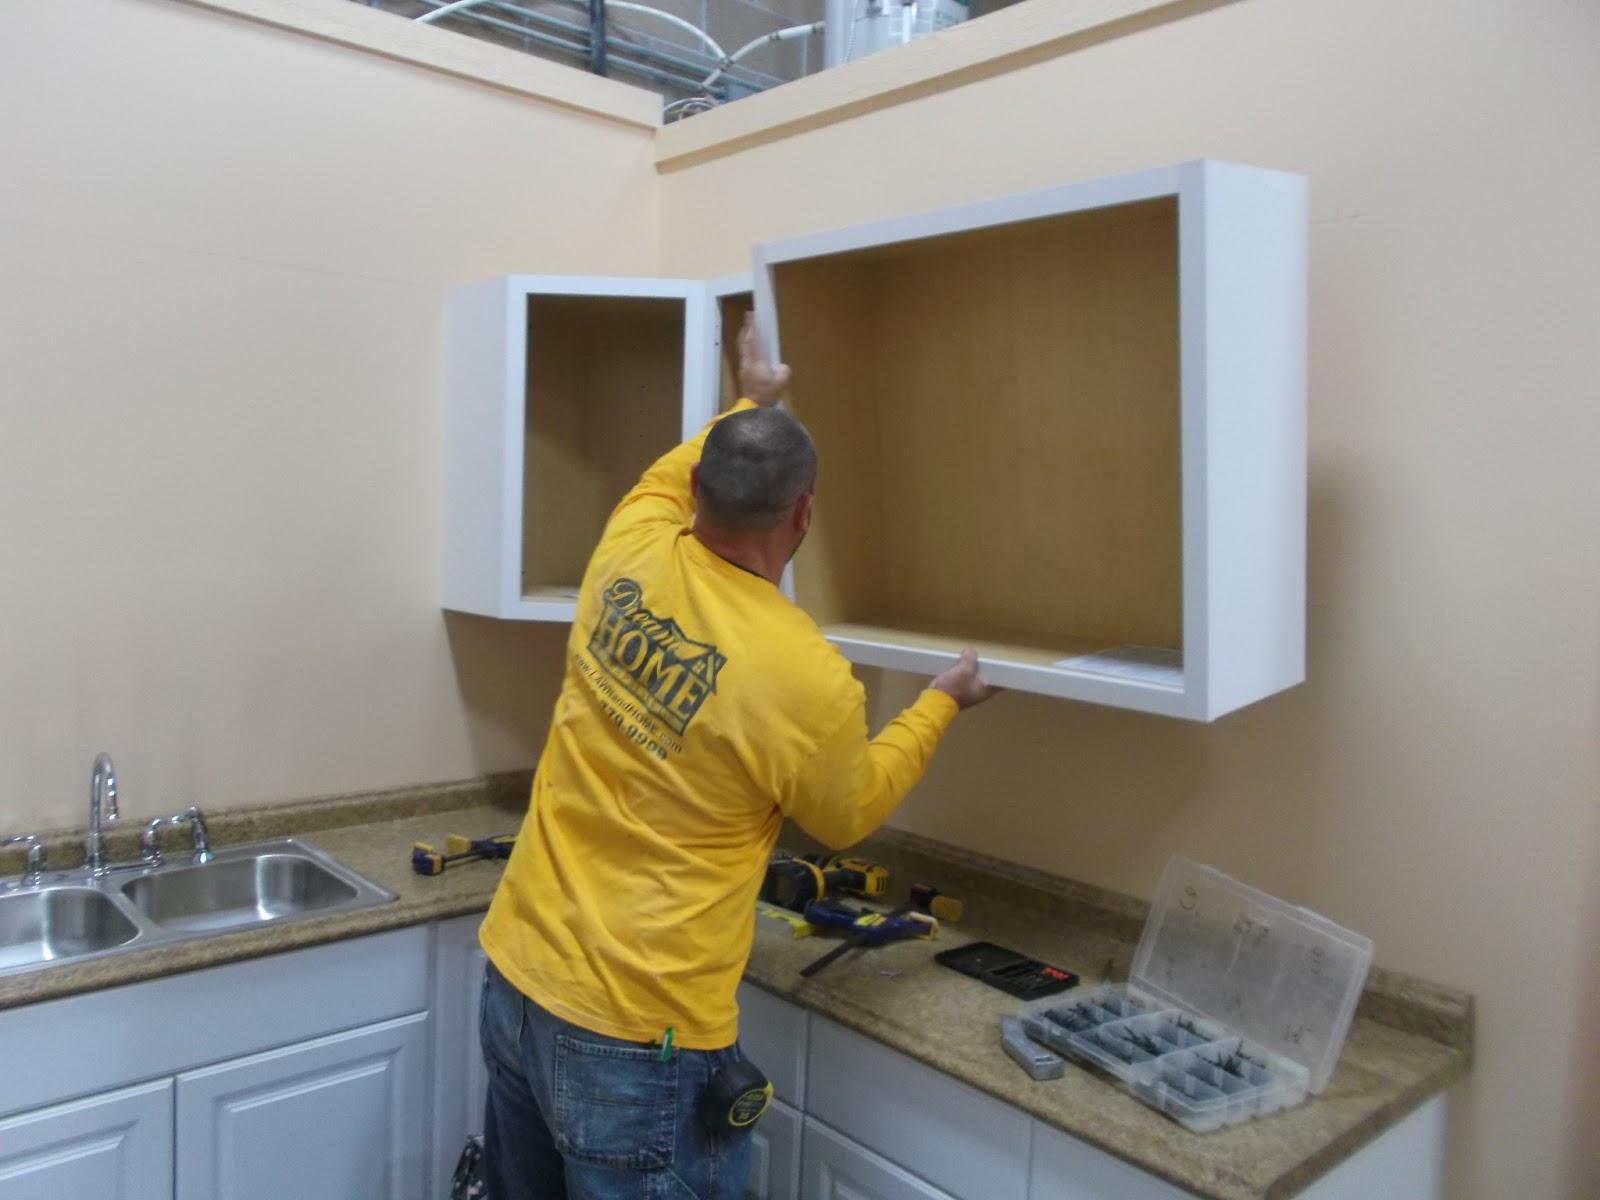 break room kitchen hampton bay kitchen cabinets Break Room Kitchen